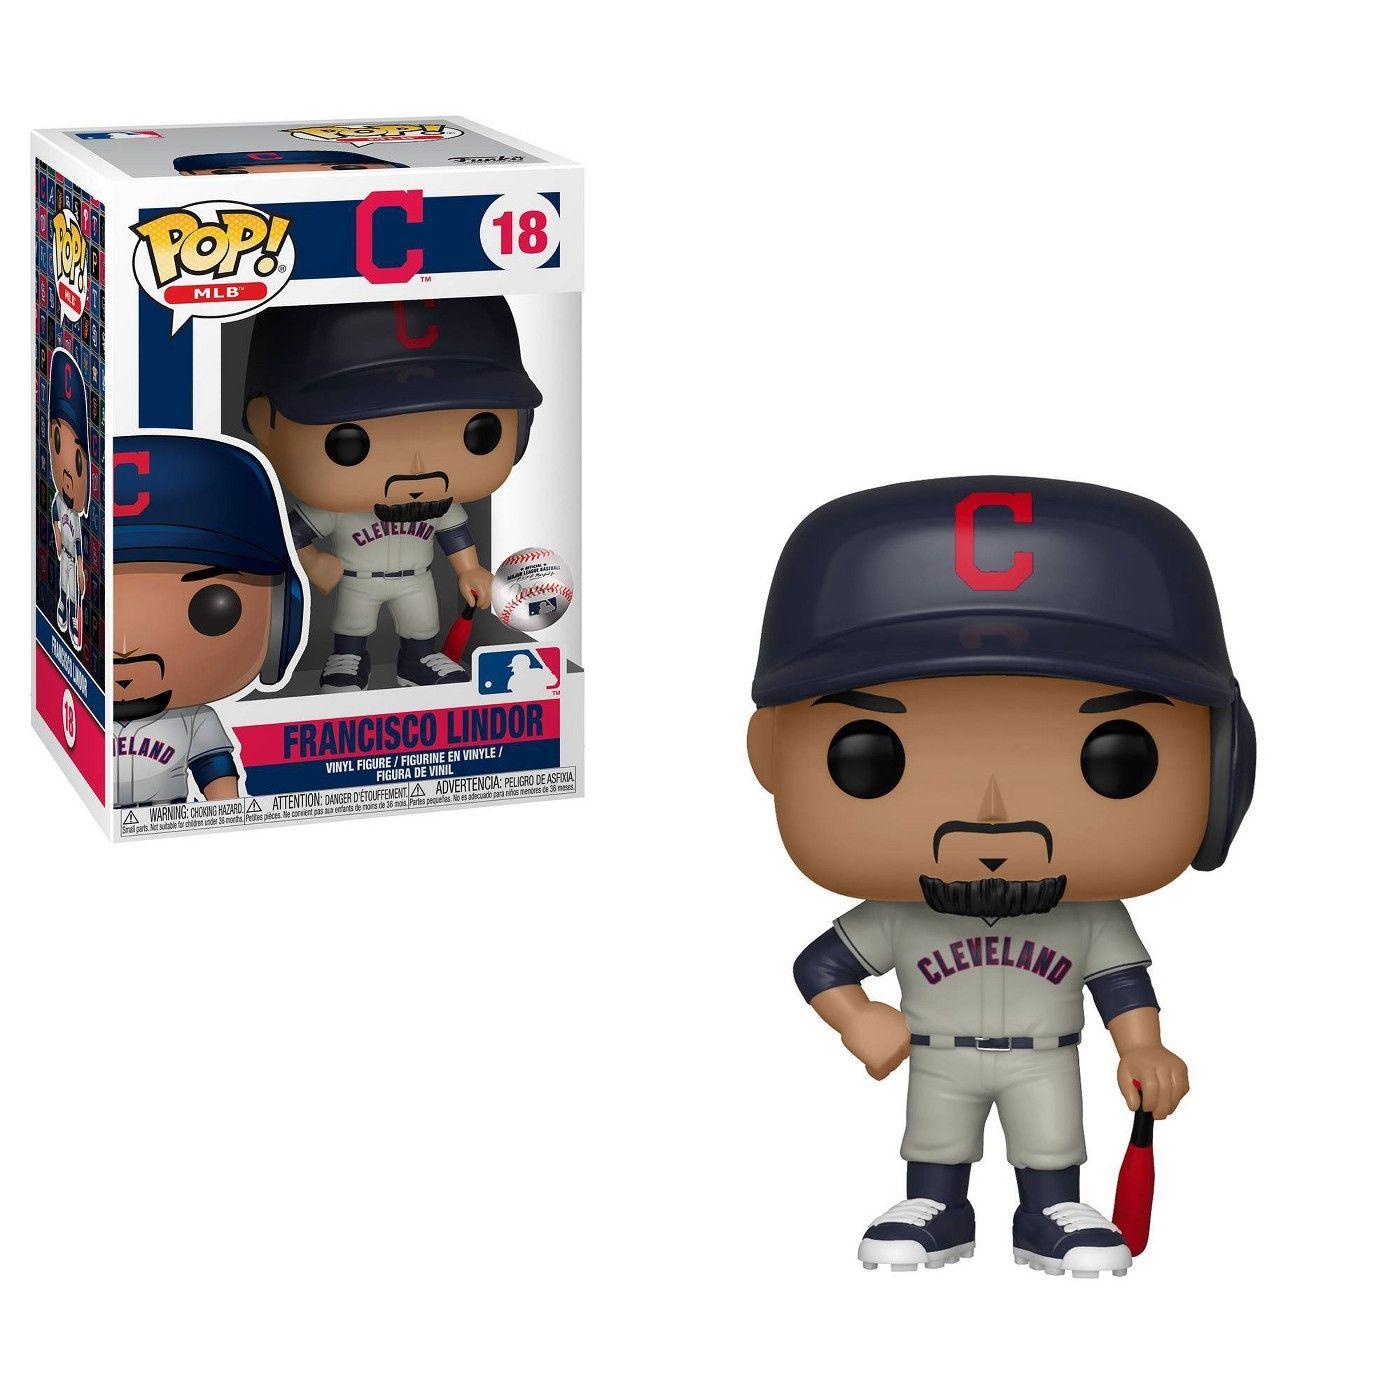 Funko Pop Mlb Cleveland Indians Sponsored Pop Ad Funko Mlb Funko Pop Mookie Betts Pop Figurine